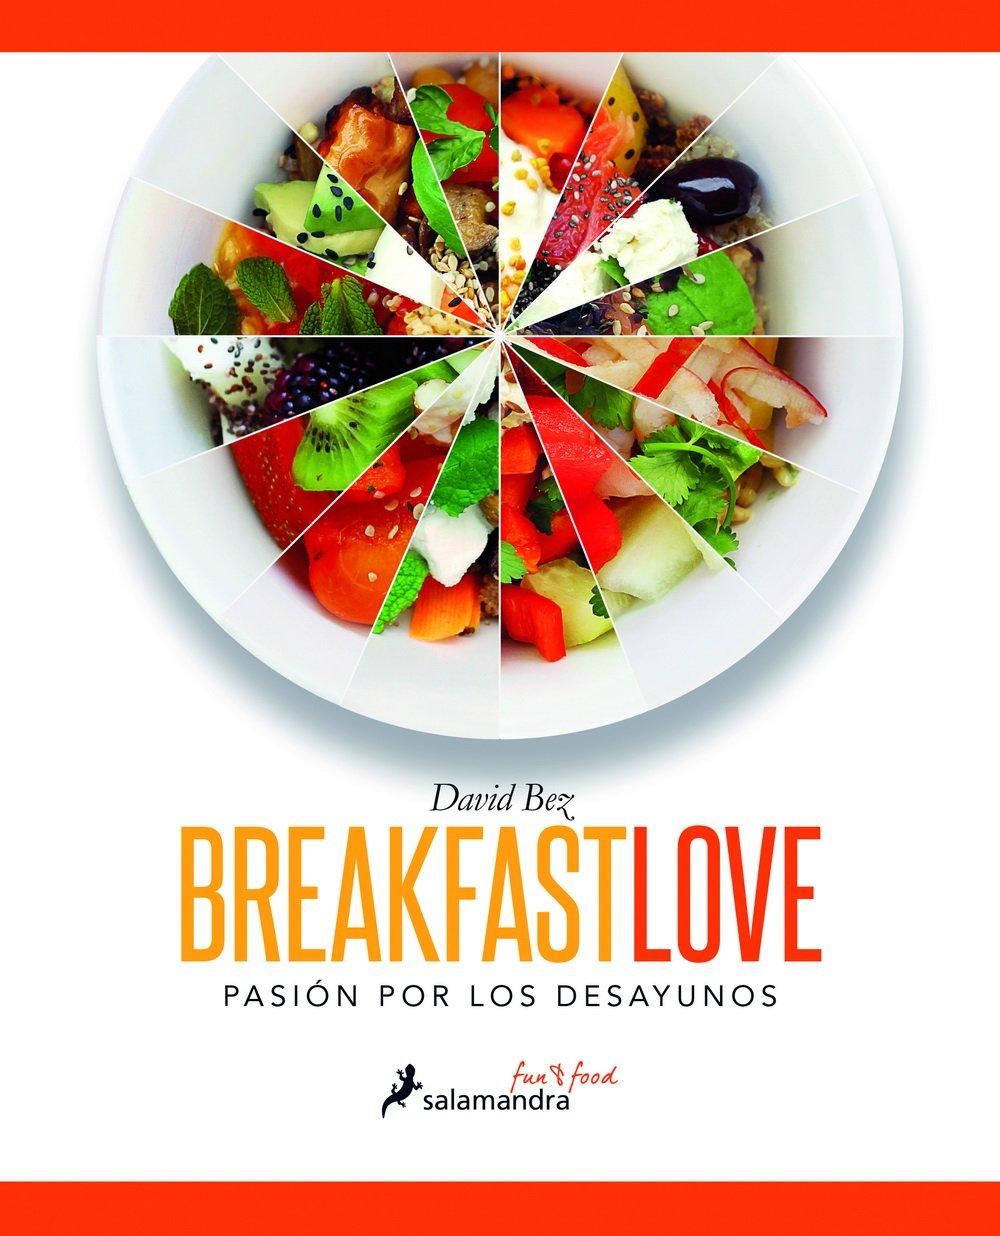 Portada libro - Breakfast love